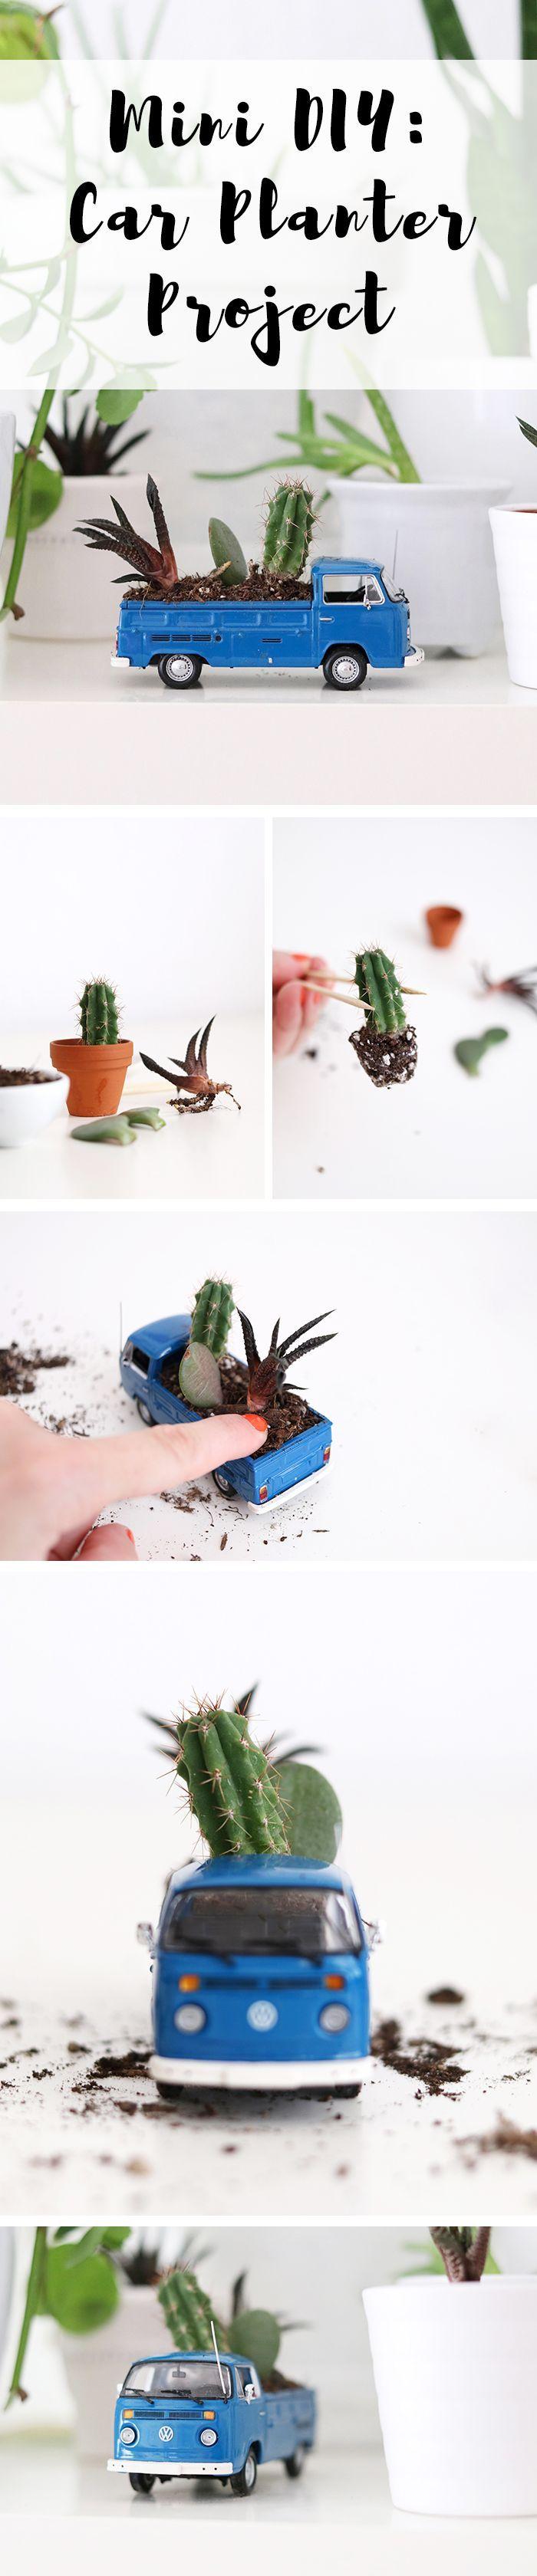 Easy Mini DIY: Car Planter Project   DIY: Deko & Upcycling für ...